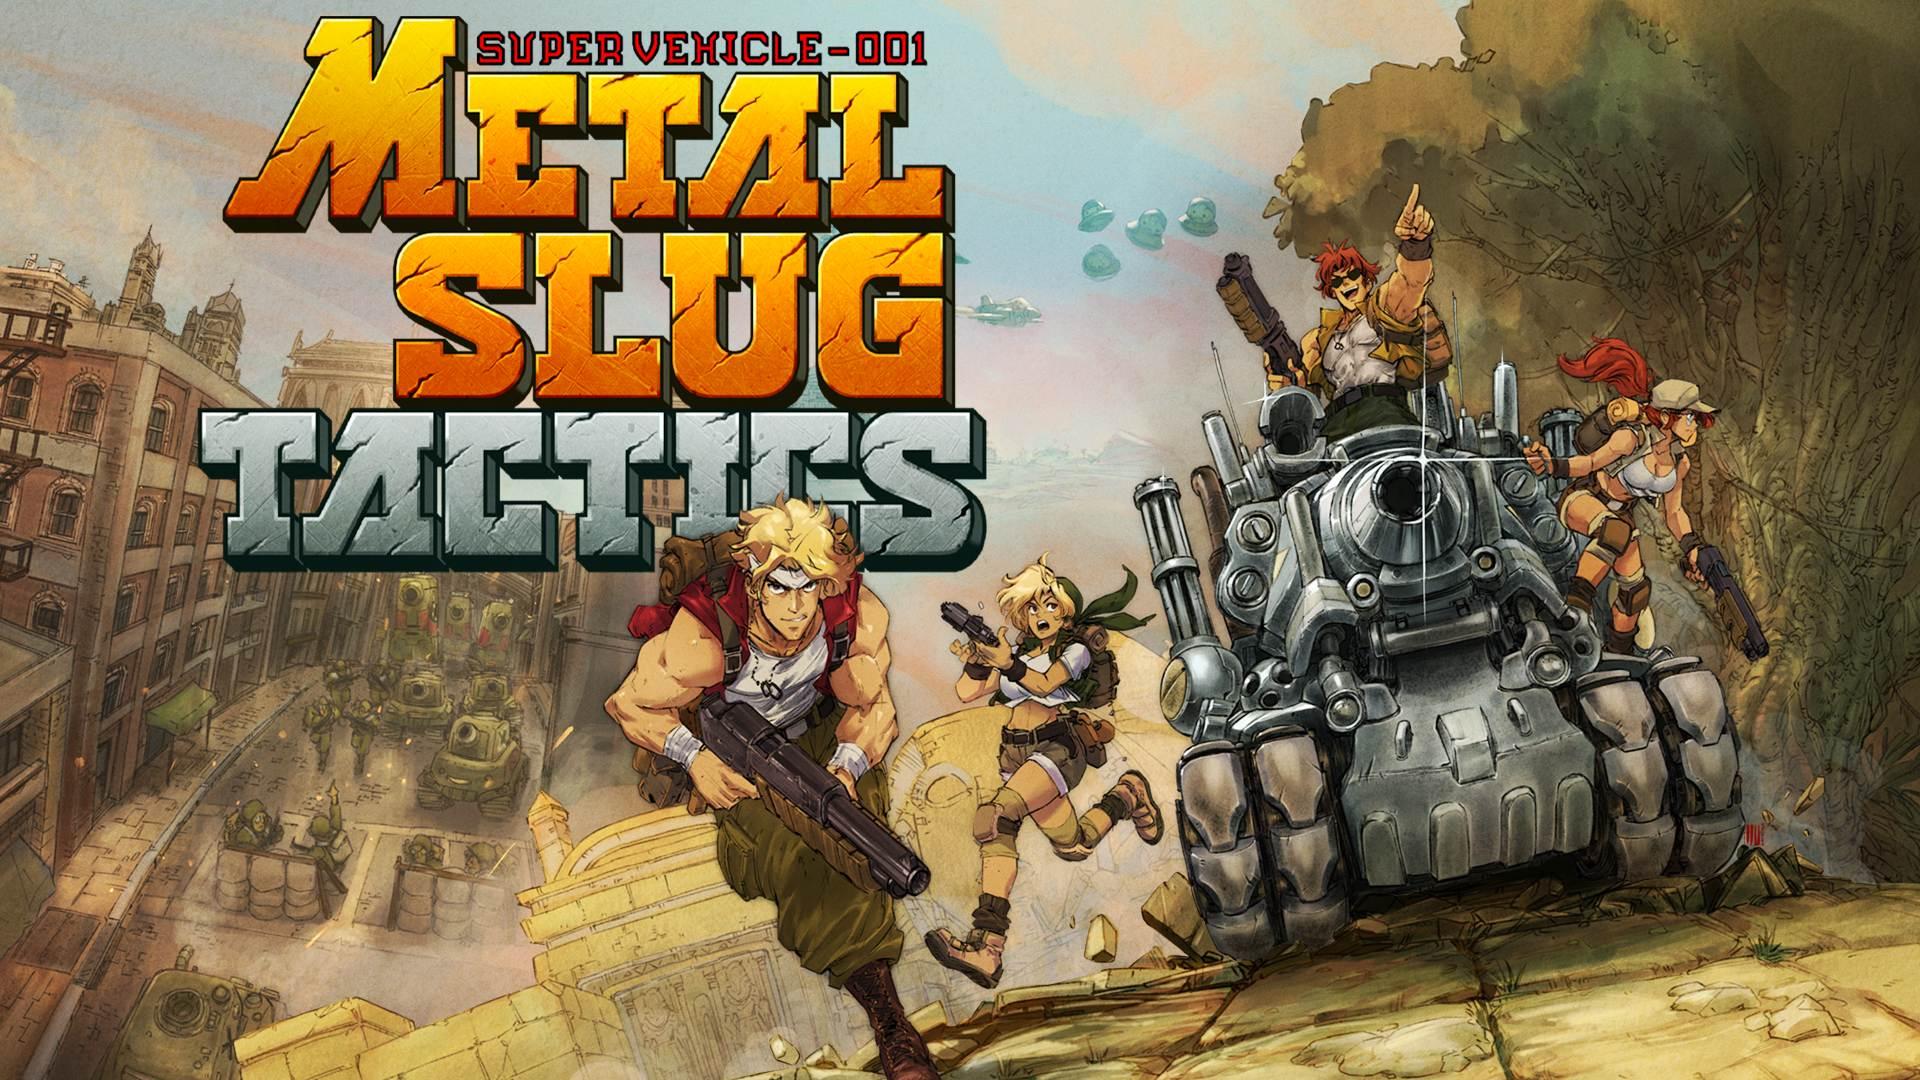 Metal-Slug-Tactics-logo.jpg